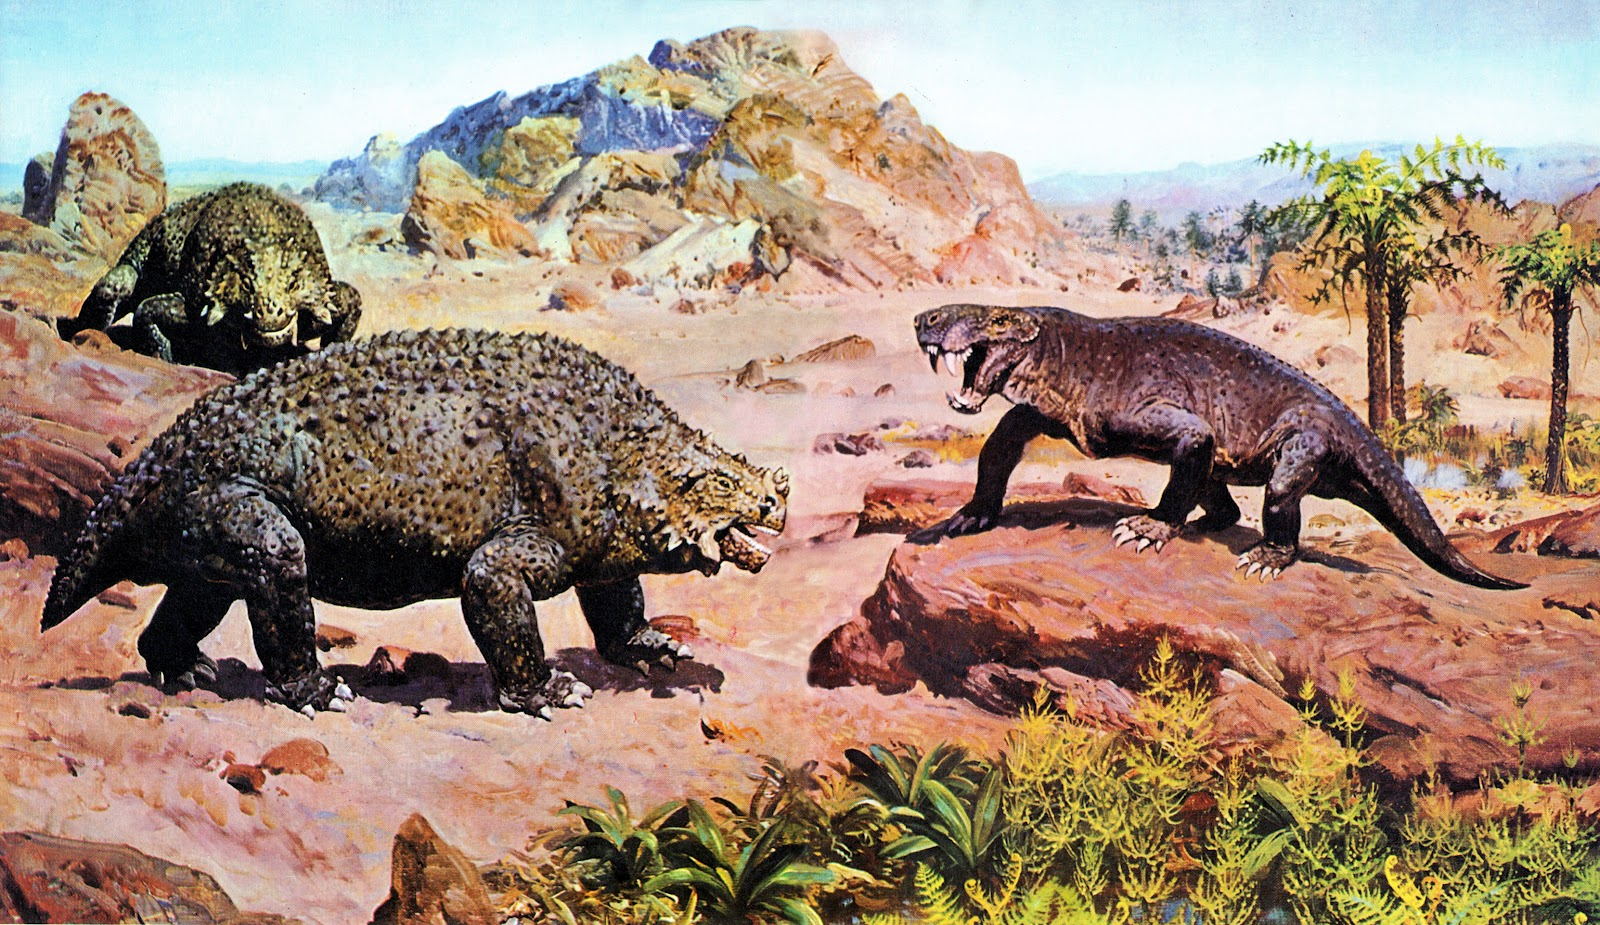 Scutosaurus and Sauroctonus